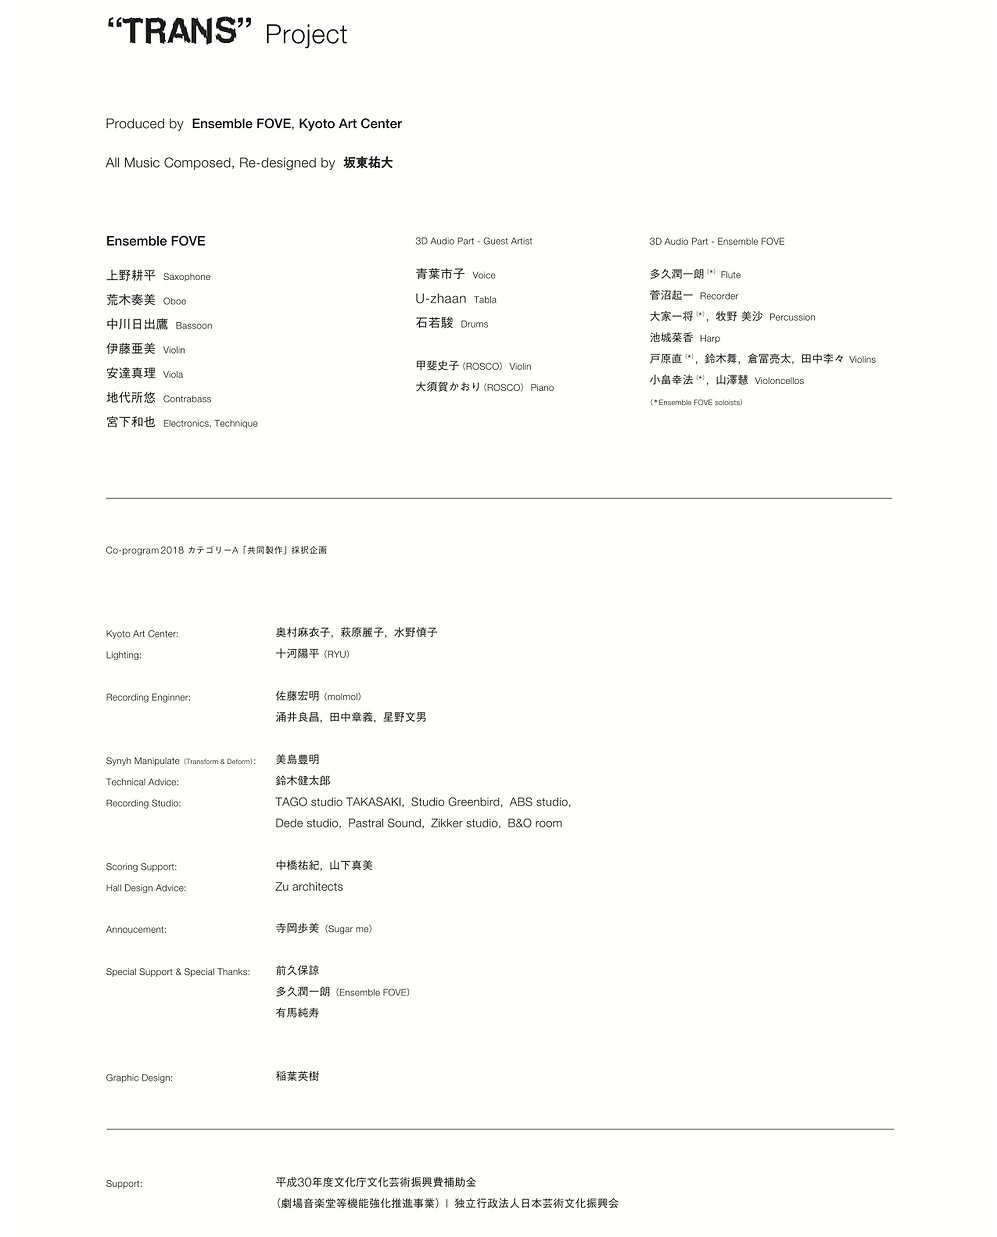 TRANS_program_演奏後_2_edited.png